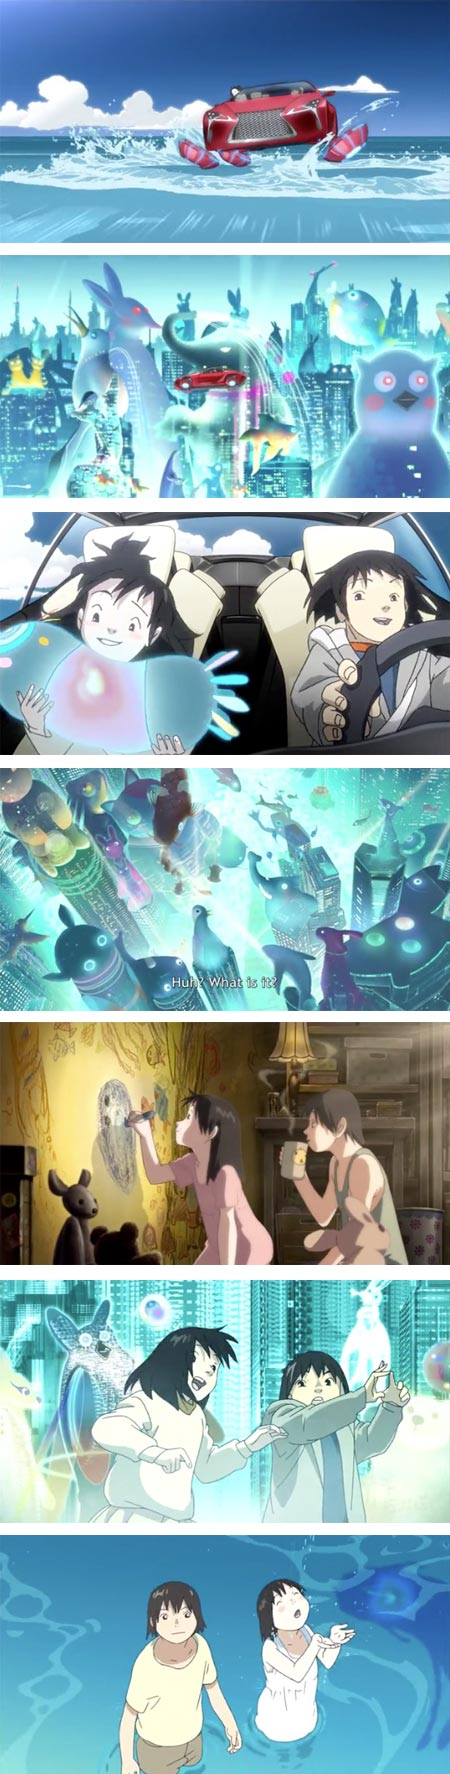 Koji Morimoto animated sequence fo Lexus